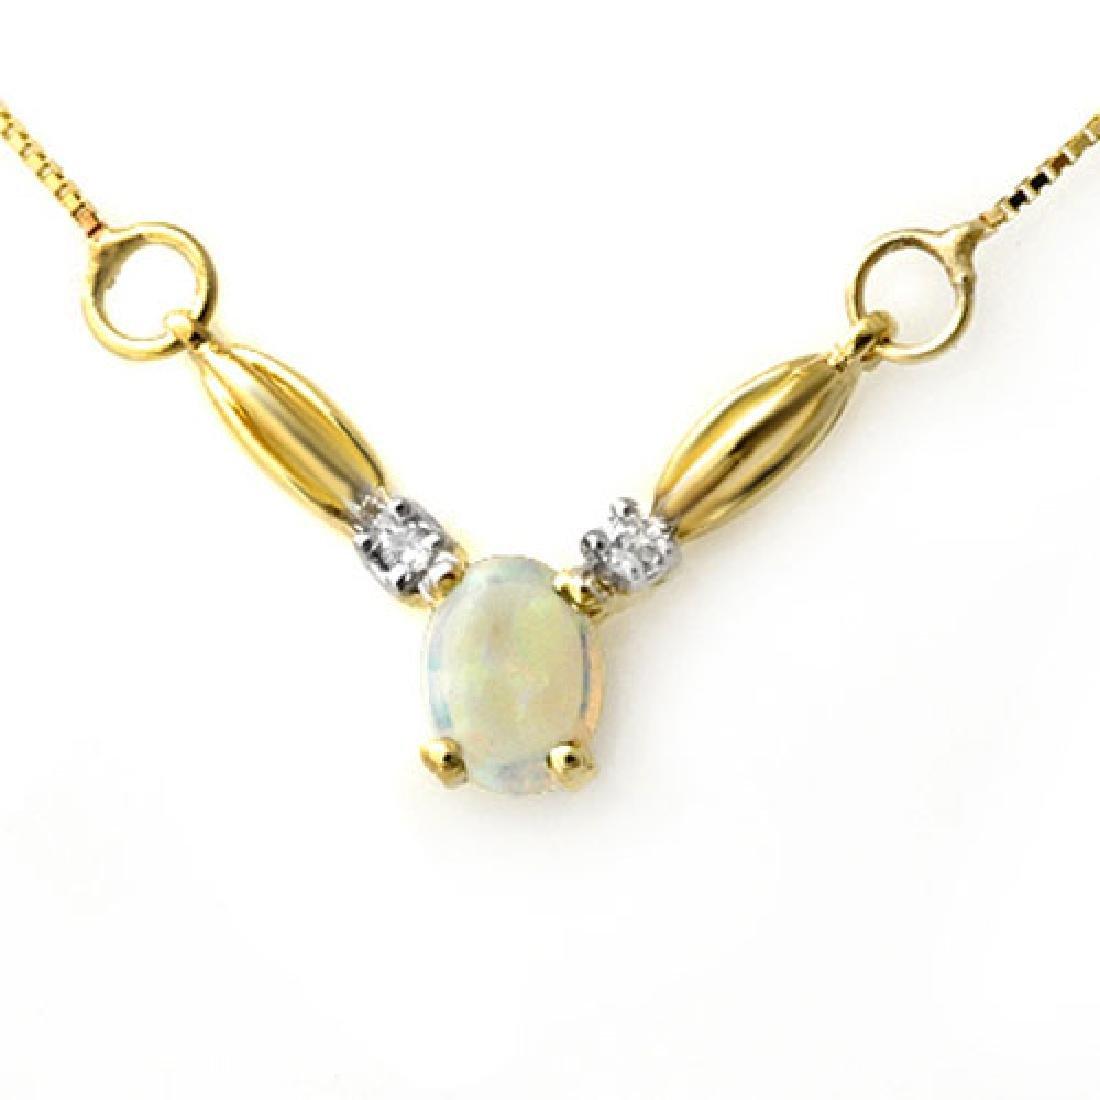 1.30 CTW Opal & Diamond Necklace 10K Yellow Gold